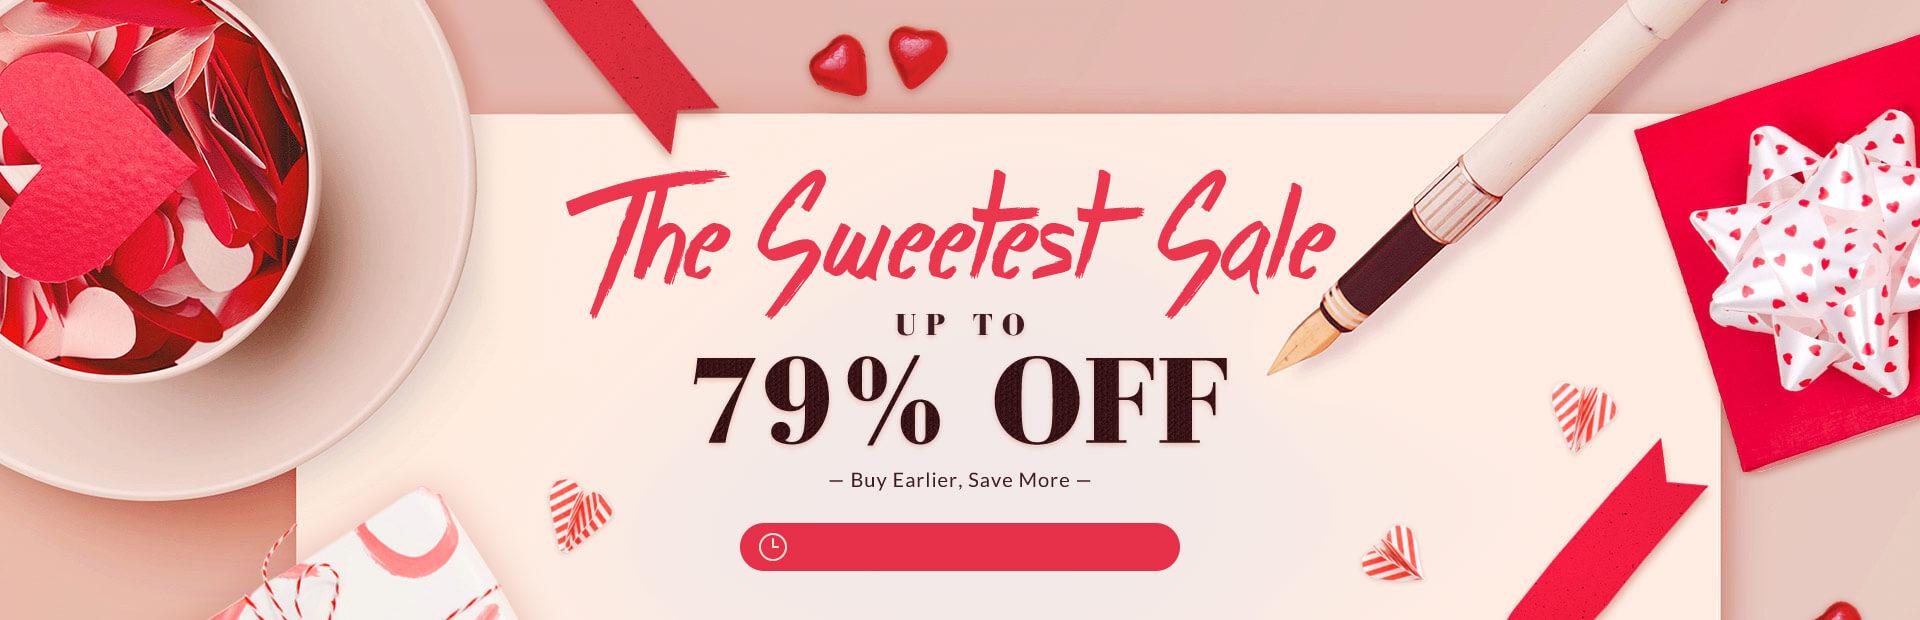 https://css.rglcdn.com/imagecache/RG/special/valentine_high/images/enbanner1.jpg